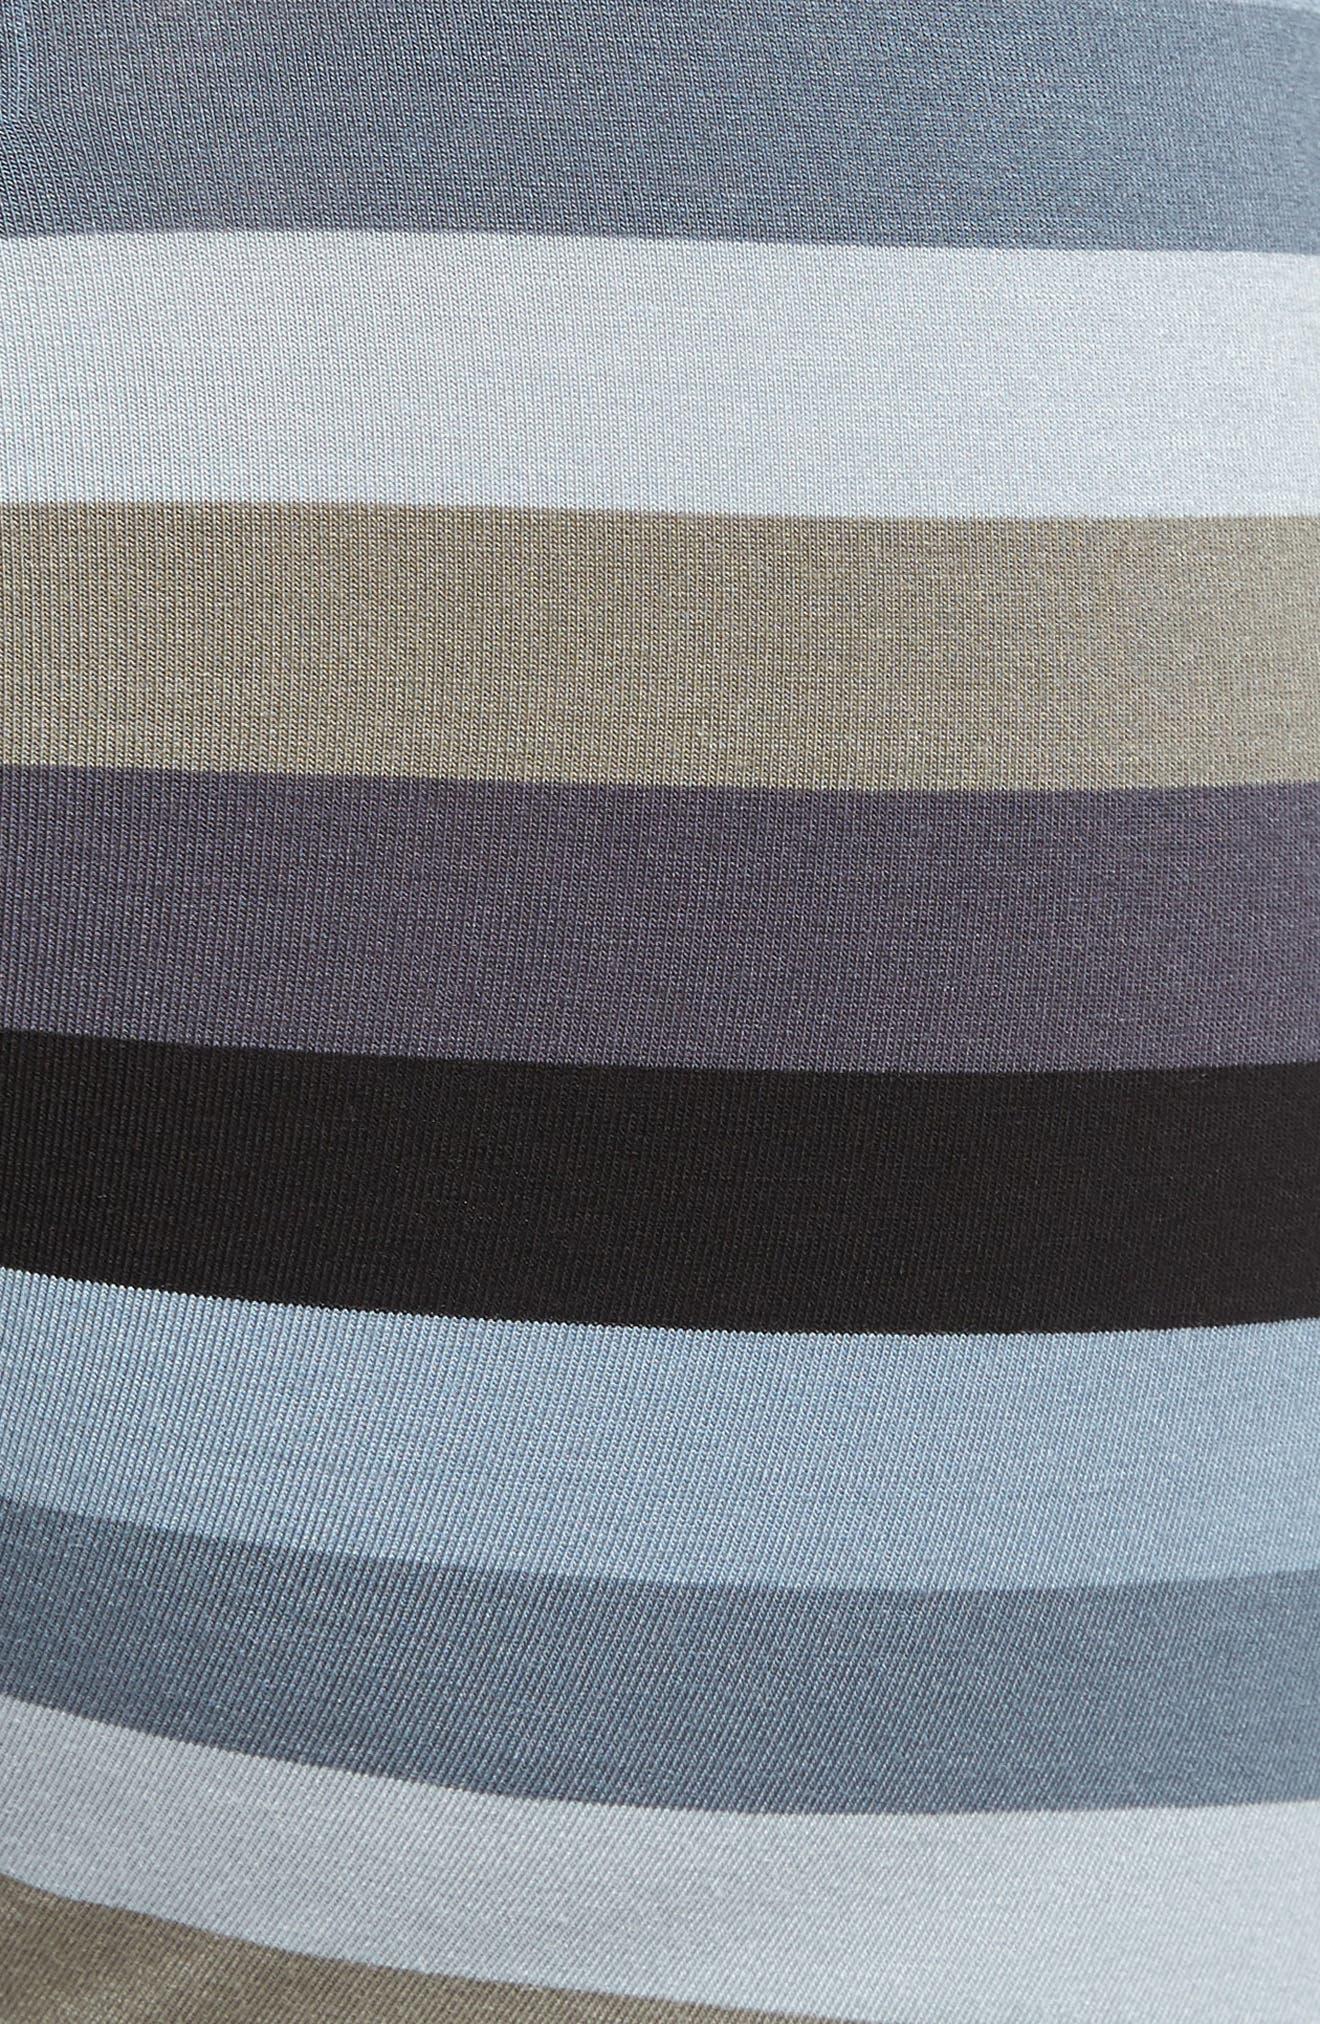 Stripe Boxer Brief,                             Alternate thumbnail 5, color,                             Dark Charcoal Stripe